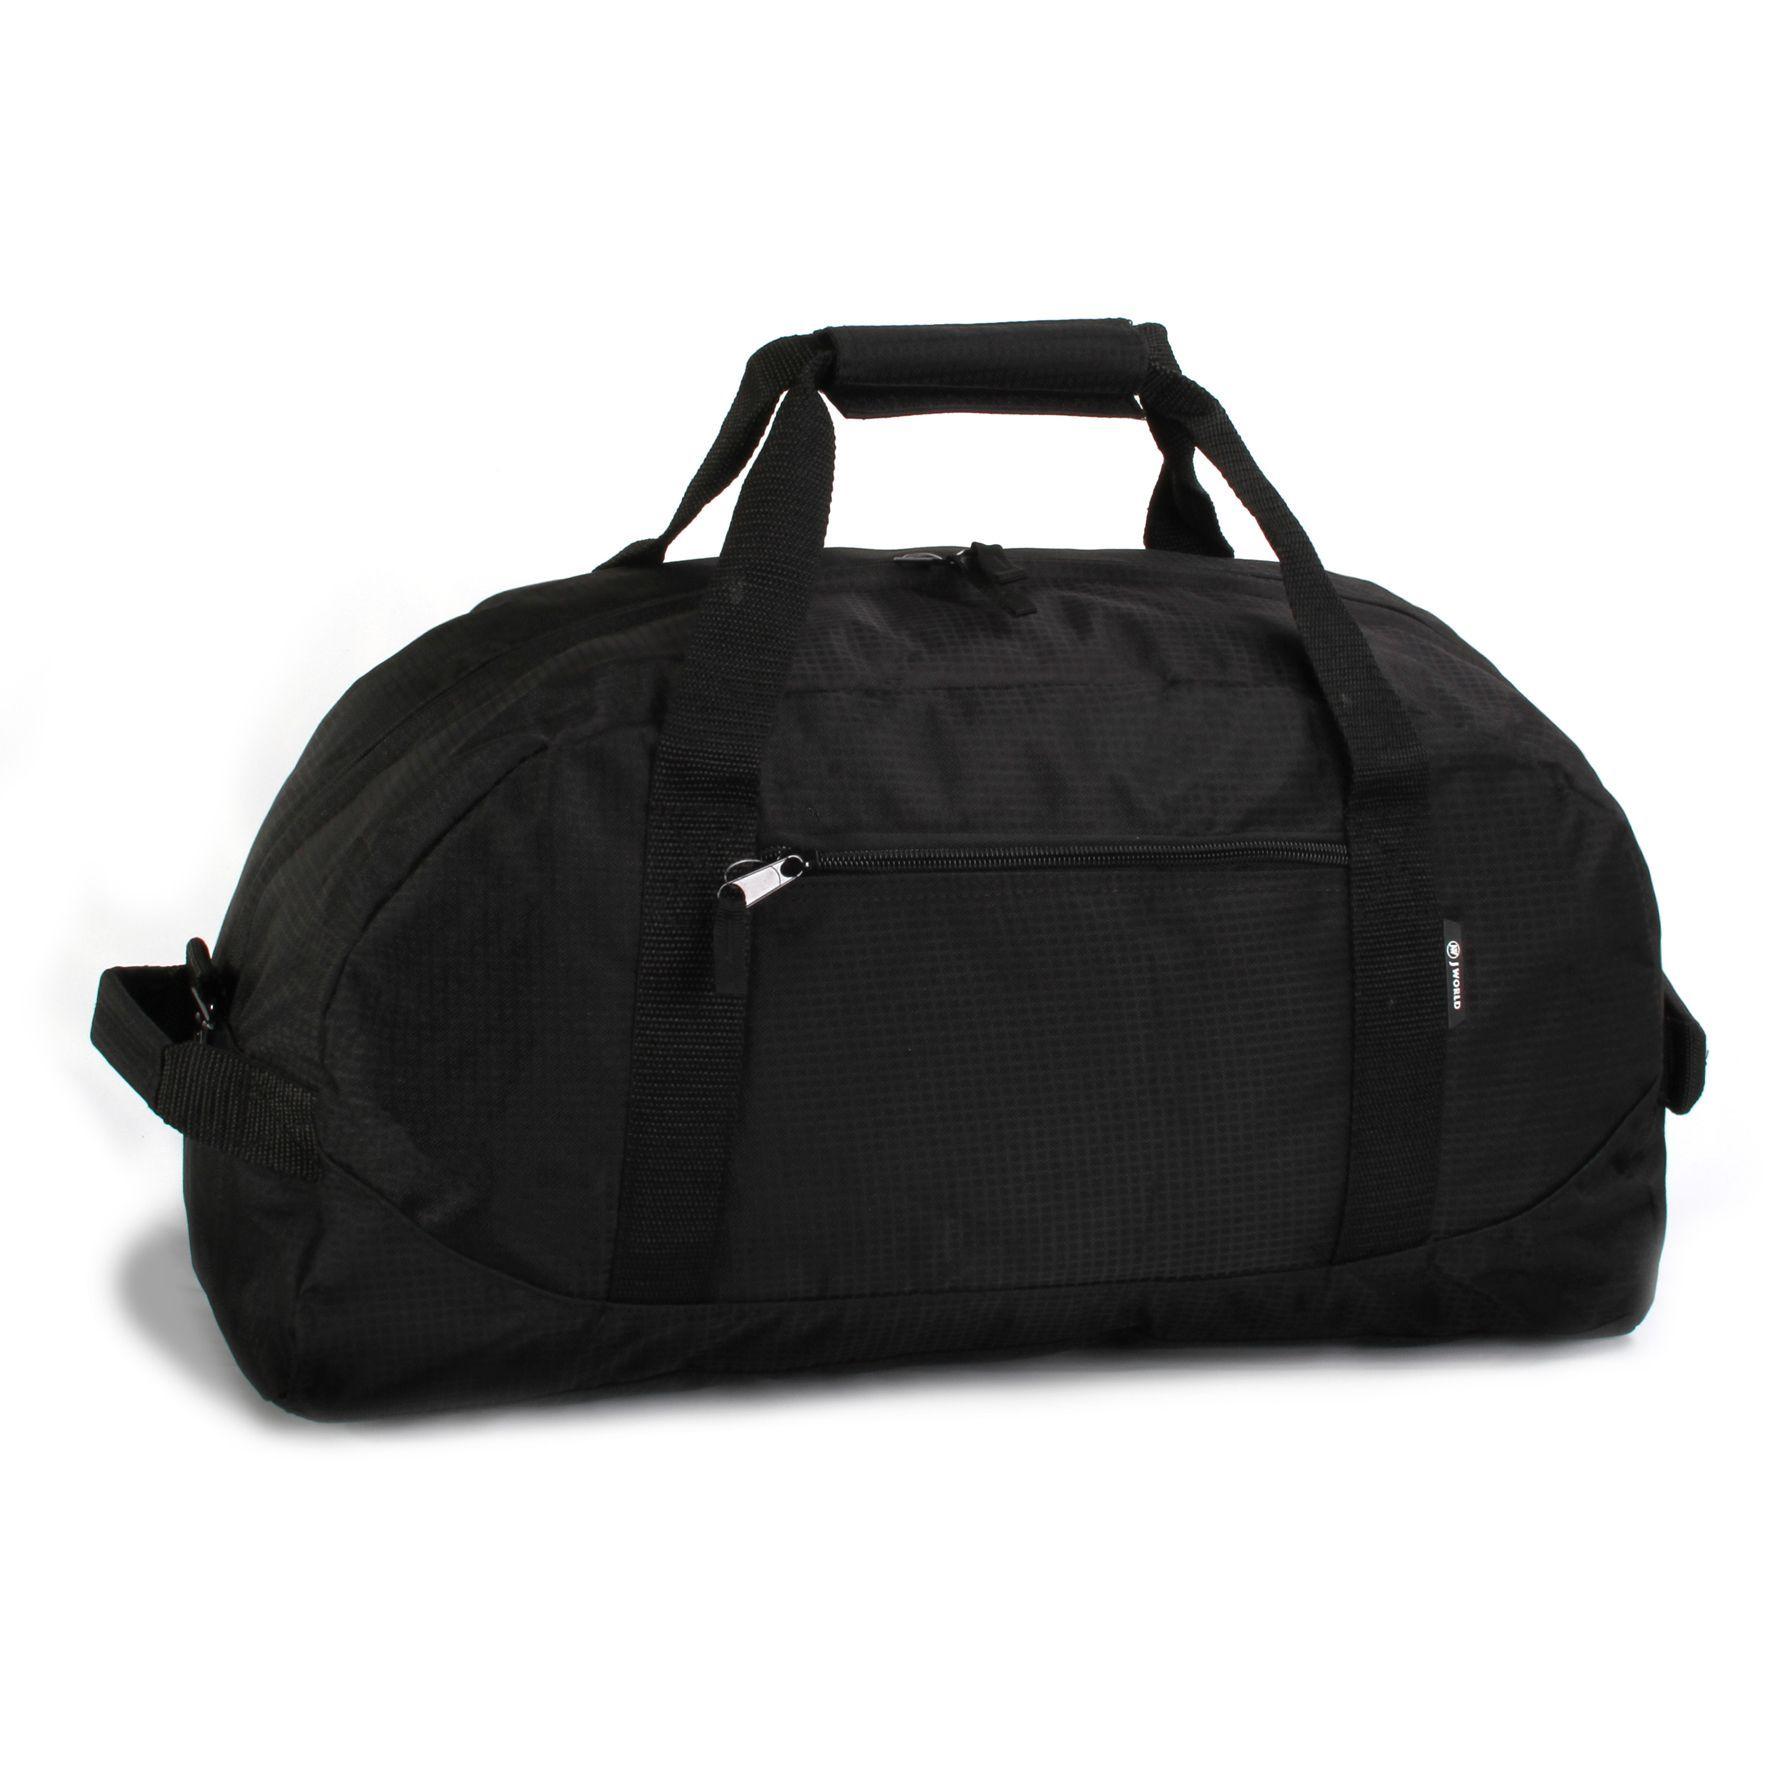 J World Lawrence 36-inch Sport Duffel Bag